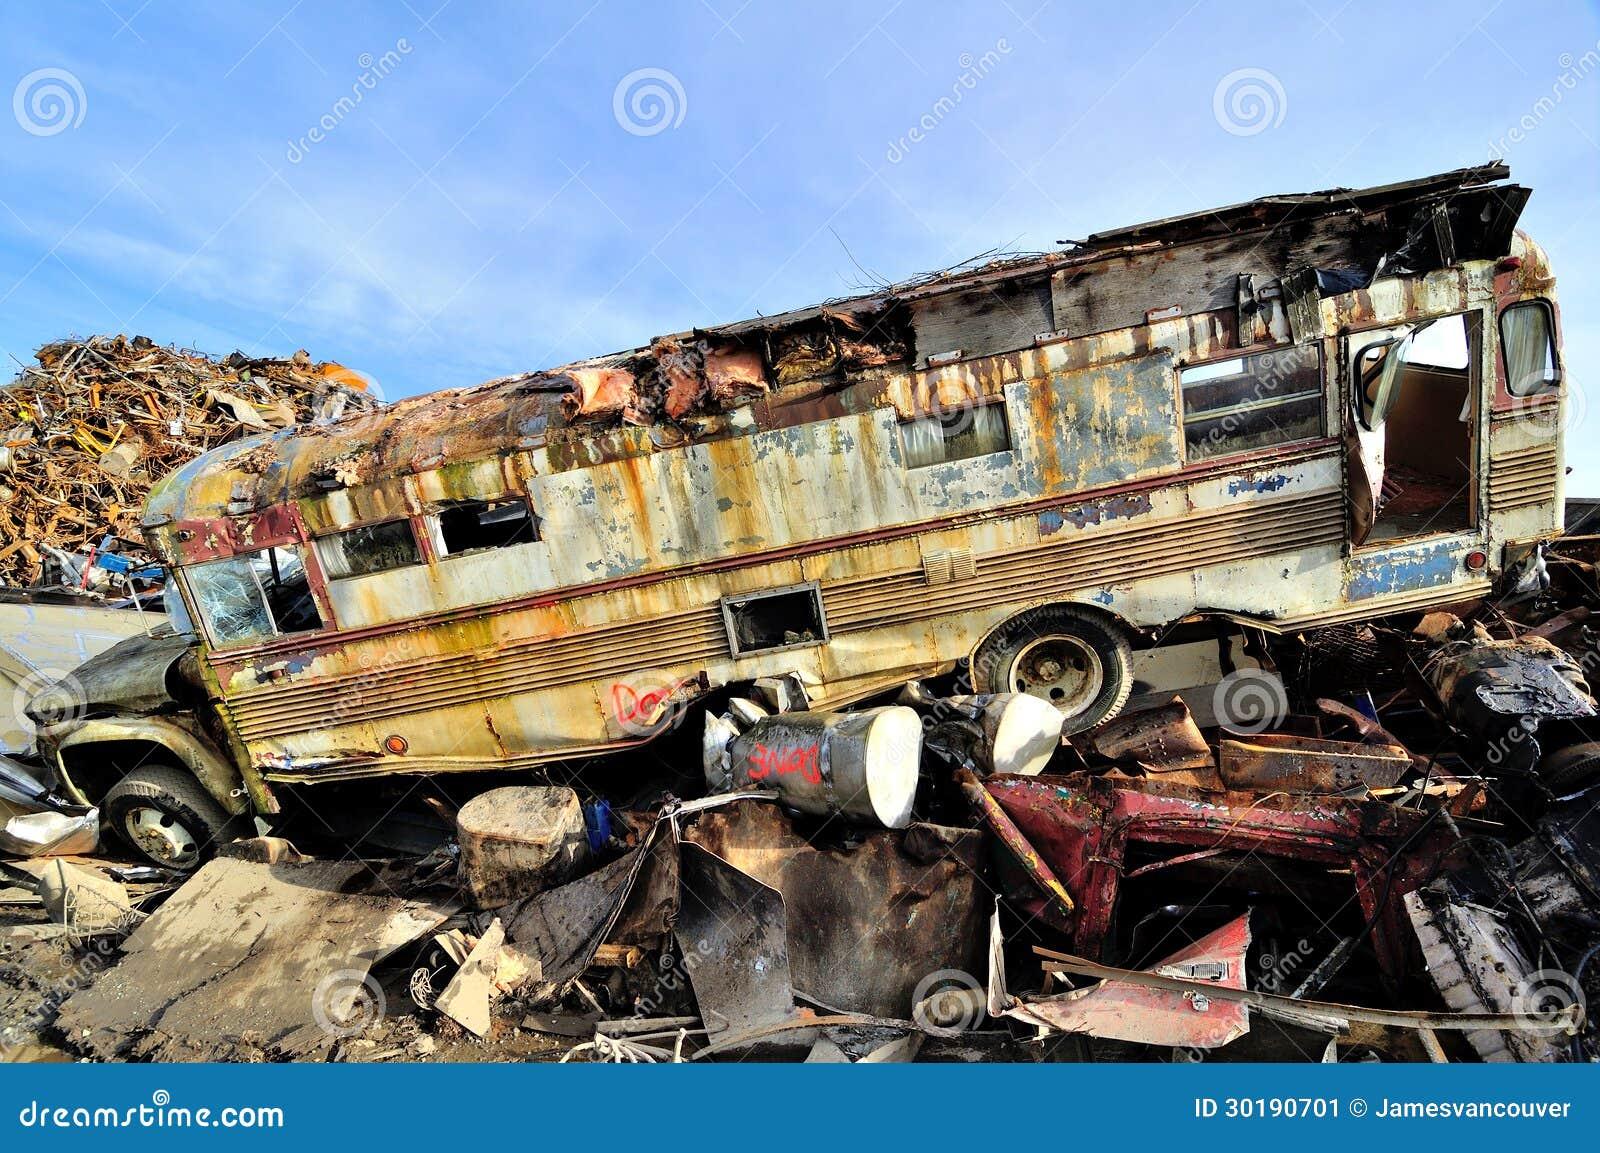 Girls Crushing iuh9DD4AratJkdzIqJh4bI00B6jgkwkgOYr3XPlNRiA besides Junk Cars besides 52 Ford F6 in addition Honda Urban Ev Concept Is A Neo Retro Hatch Of Awesomeness also Places. on old junk cars